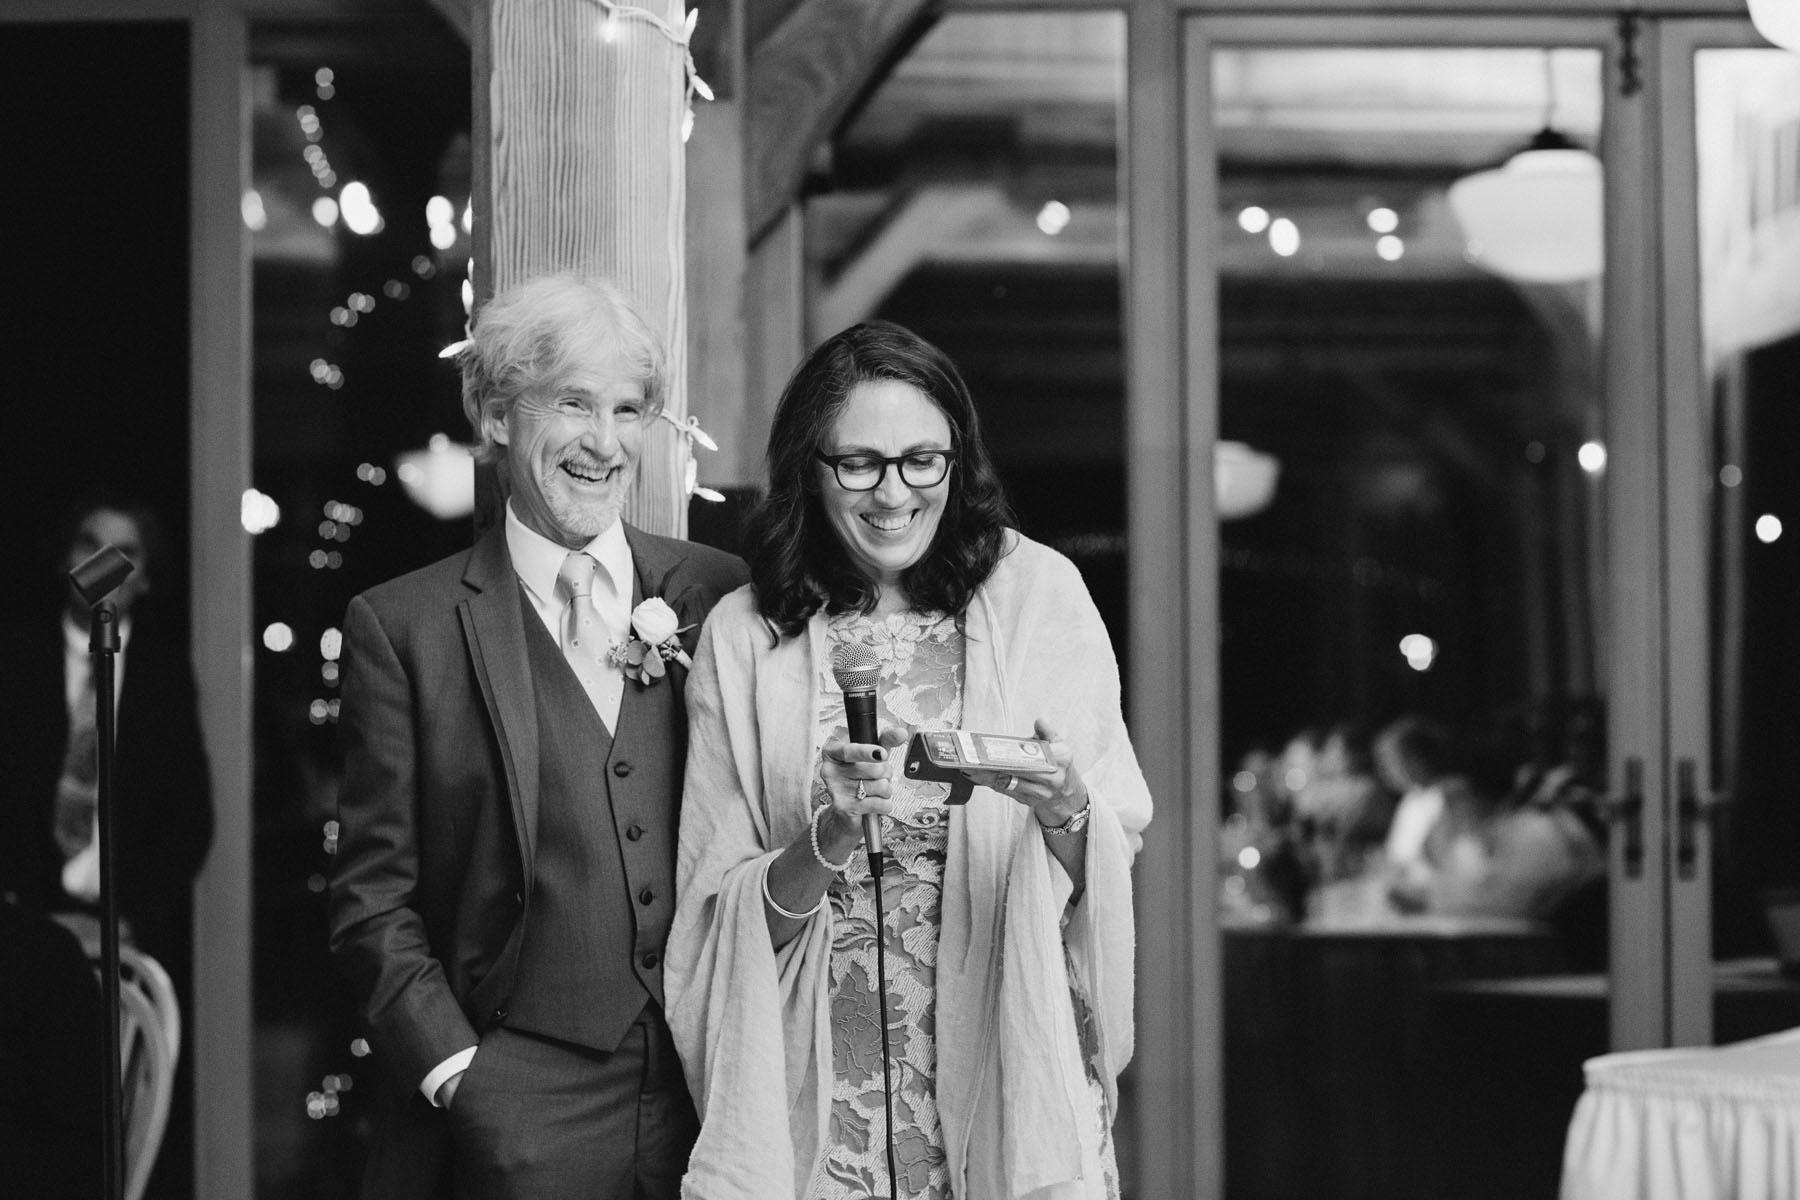 thetis-island-wedding-photographer-rp-rn-197.jpg